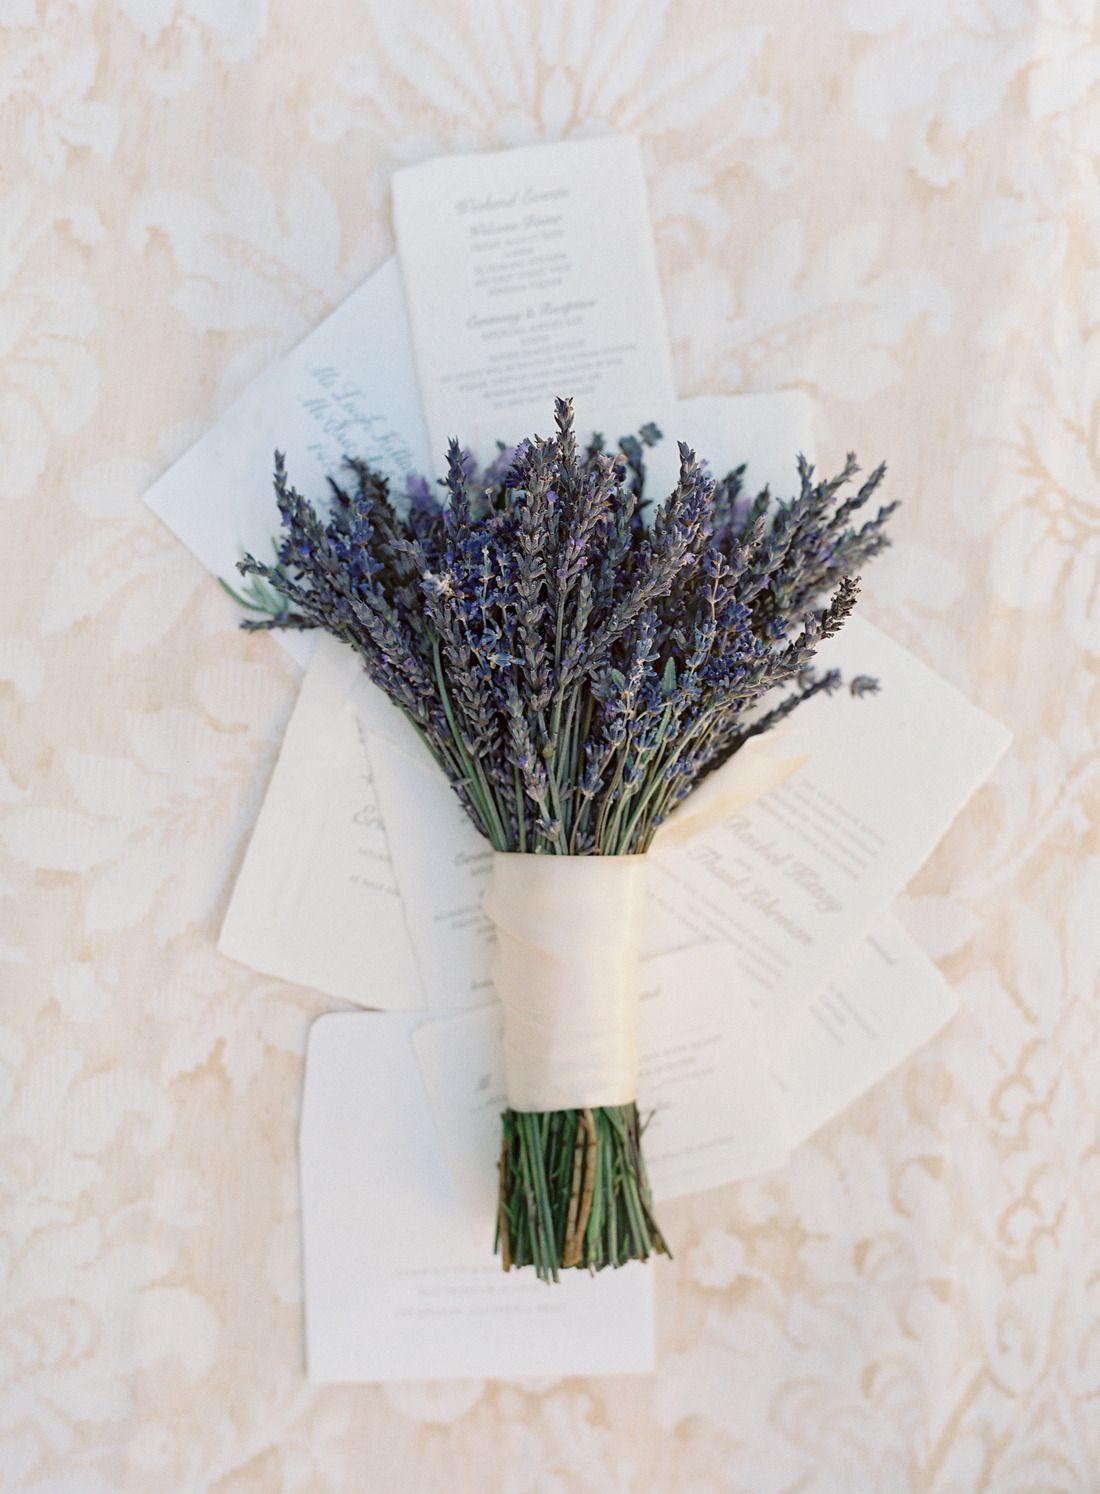 #lavender, #bouquet  Photography: Jose Villa Photography - josevillaphoto.com  Read More: http://www.stylemepretty.com/2014/03/04/elegant-outdoor-wedding-in-kenwood-california/